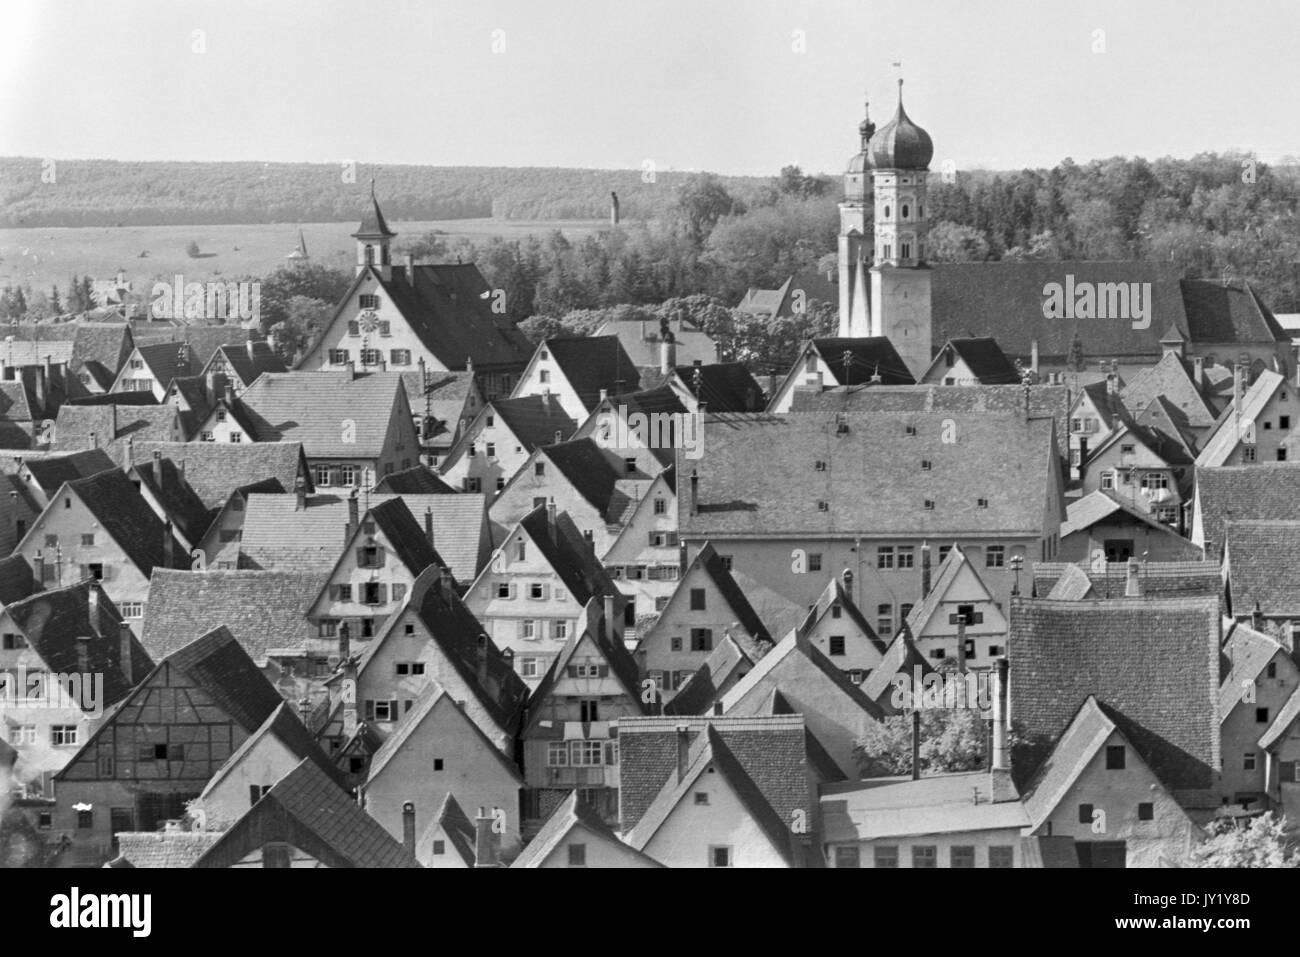 European townscape. - Stock Image